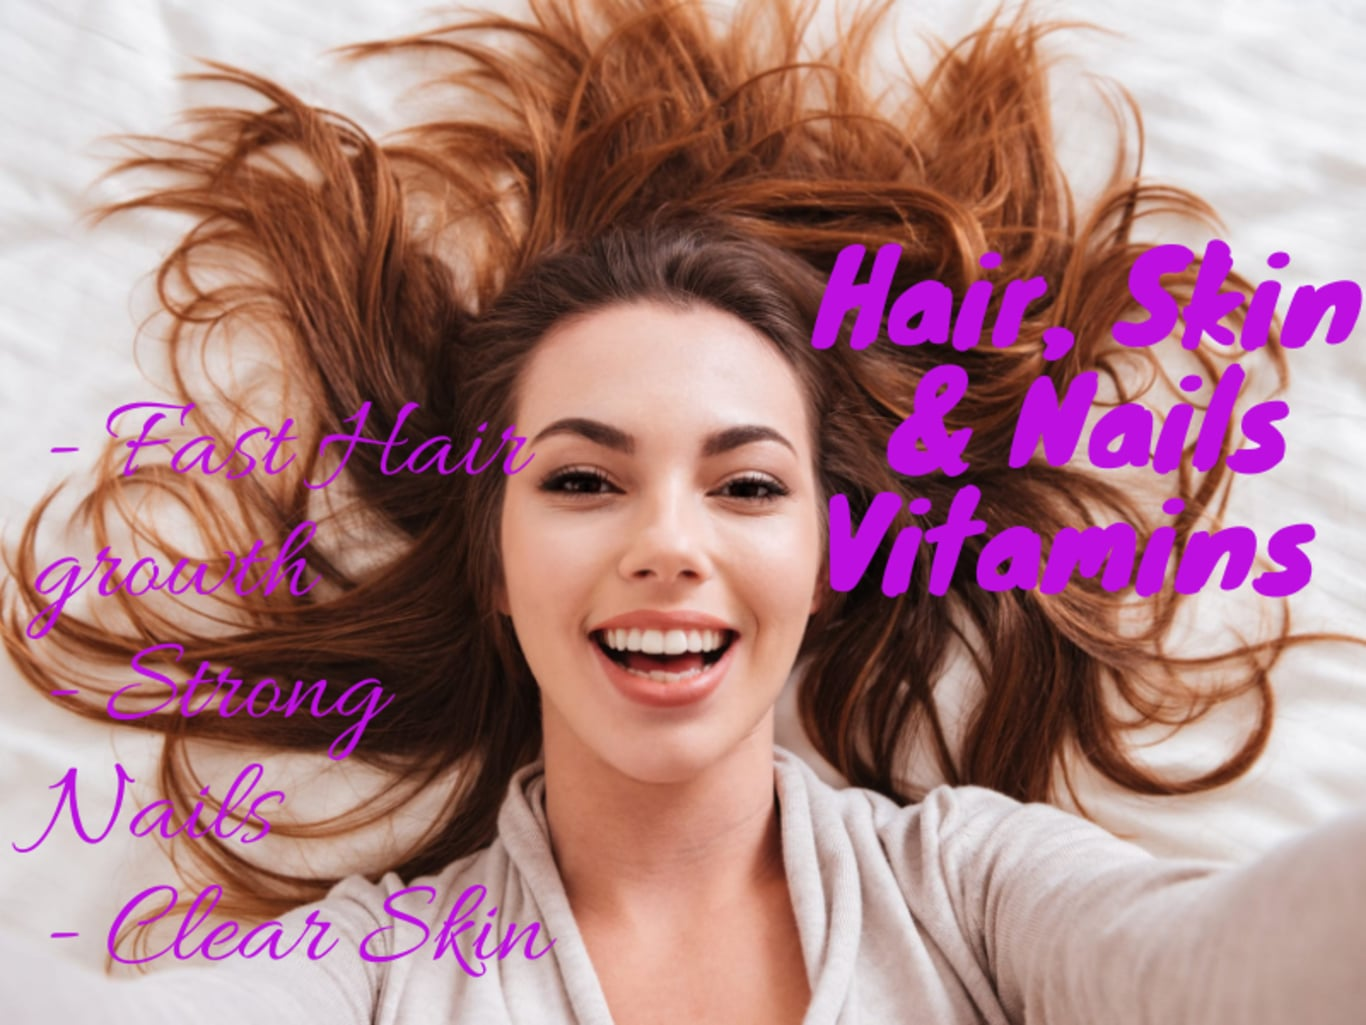 best hair, skin, nail vitamins without gelatin